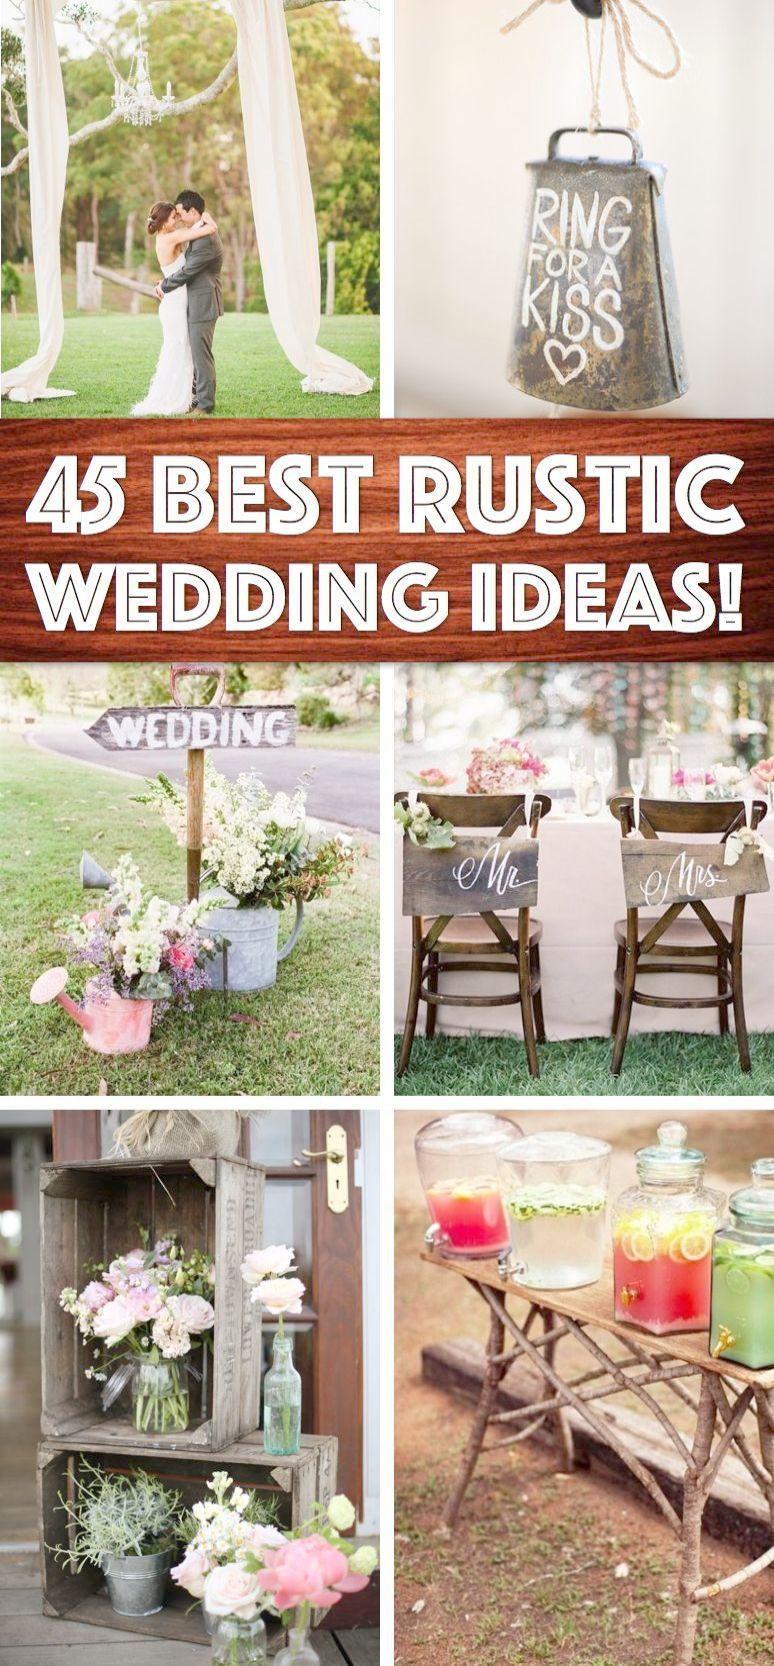 Wedding decorations to take abroad  Wedding Day Greetings DIY Weddings Abroad  Wedding Ideas